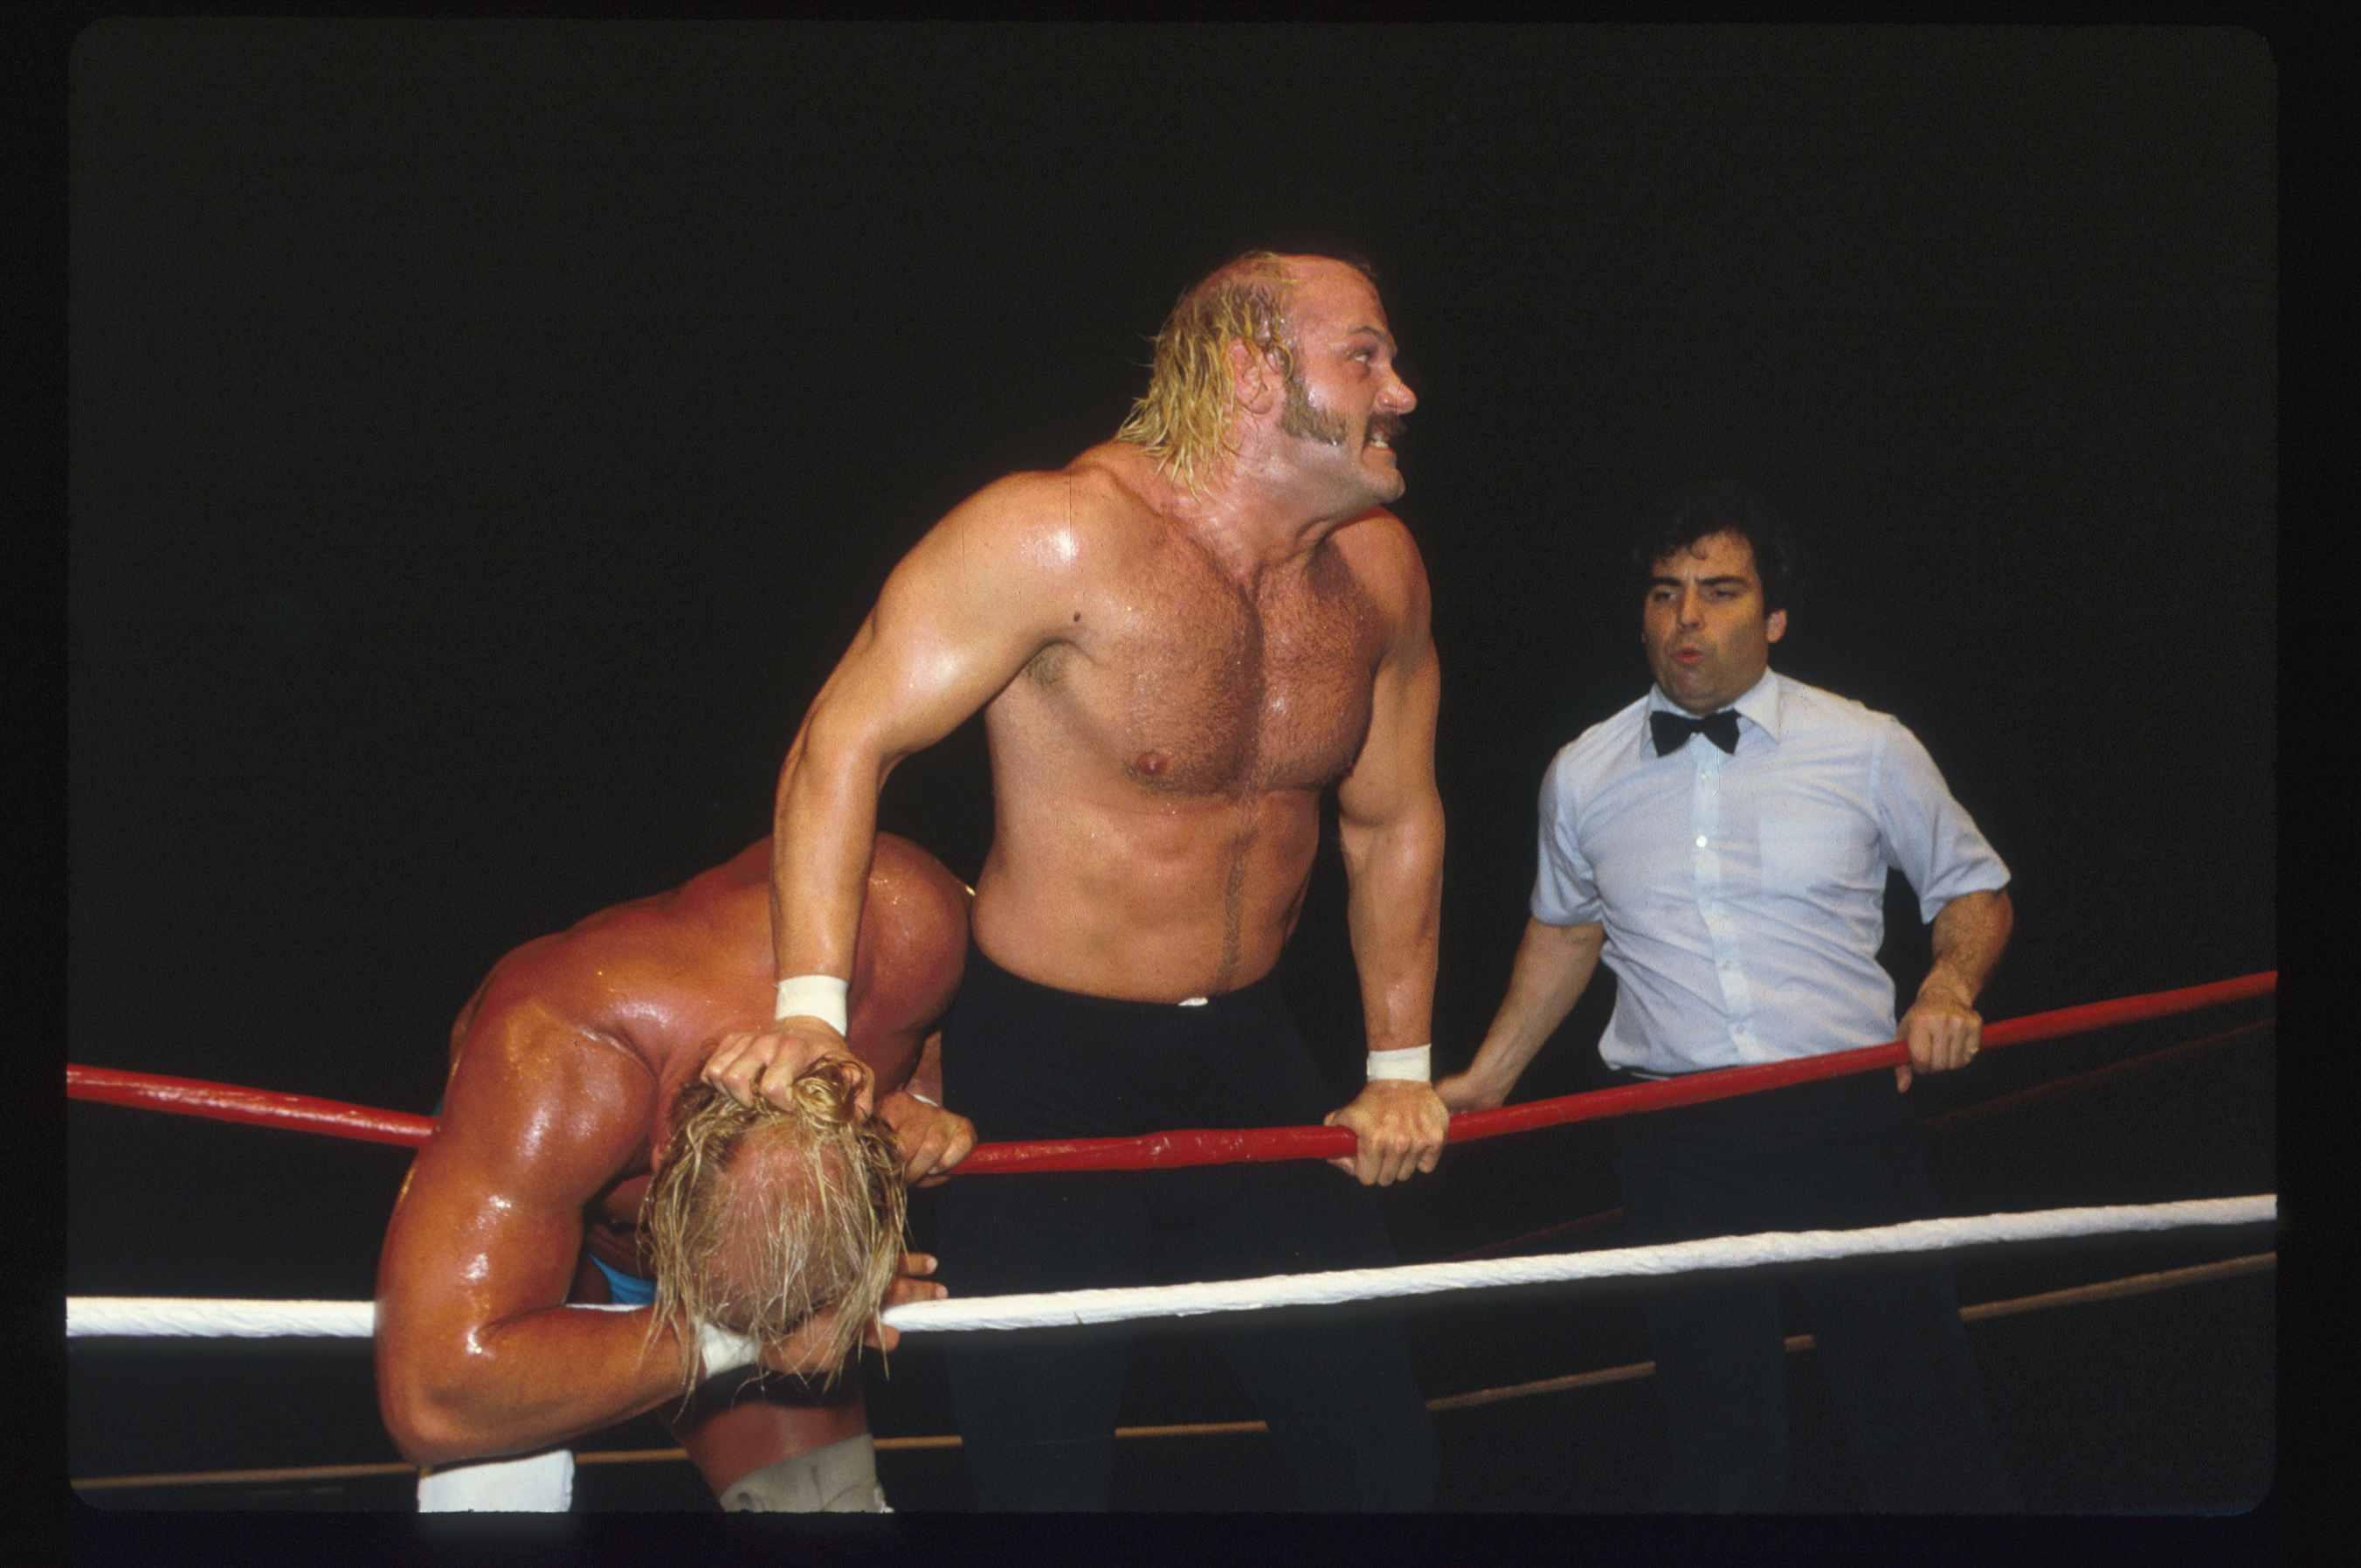 Wrestlers Hulk Hogan and Jesse 'The Body' Ventura